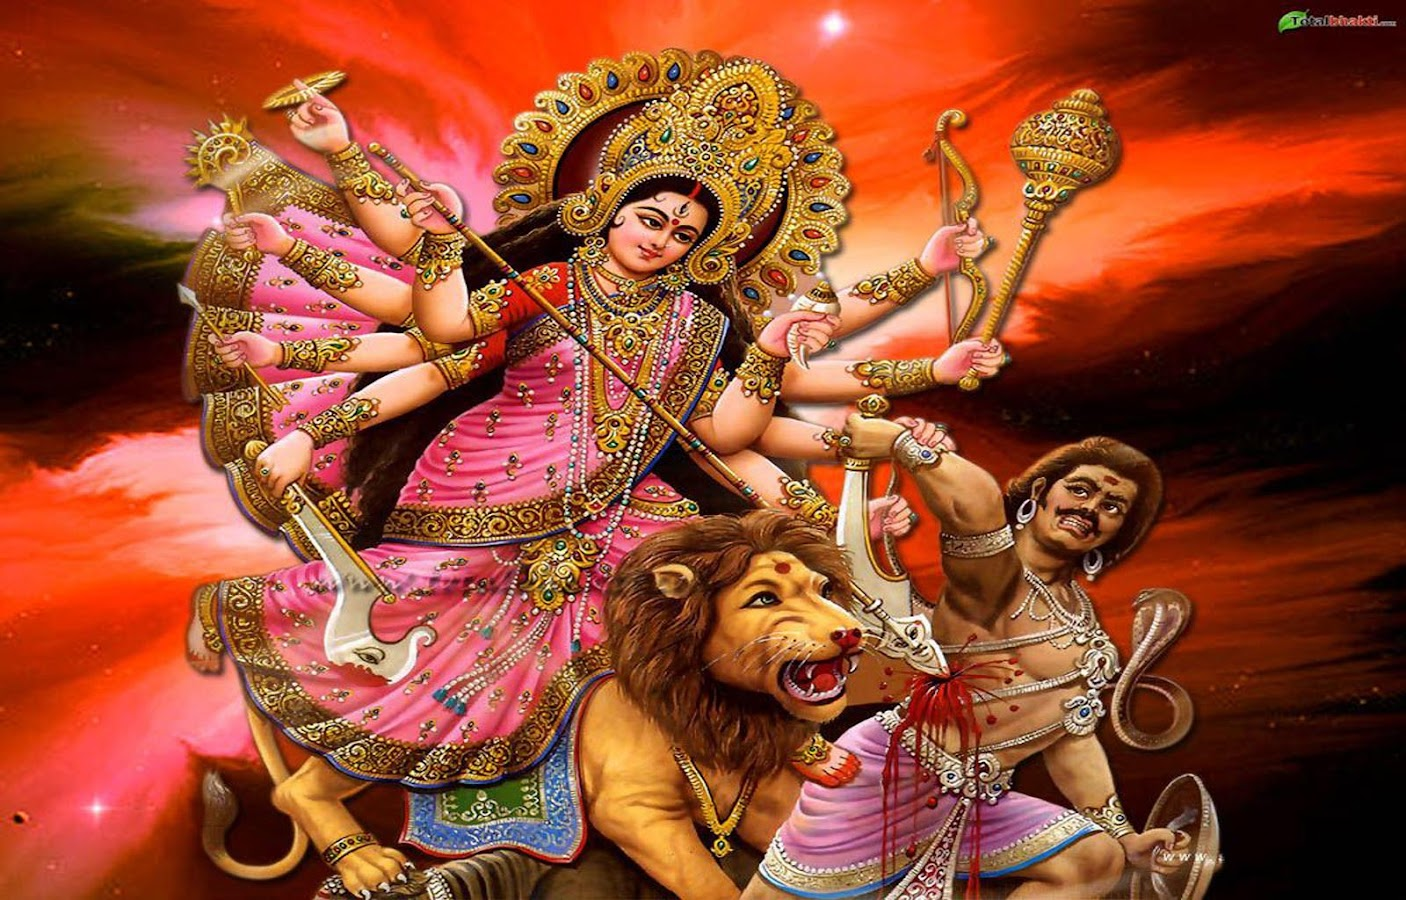 Wallpaper download karna hai - Durga Sherawali Wallpaper Screenshot